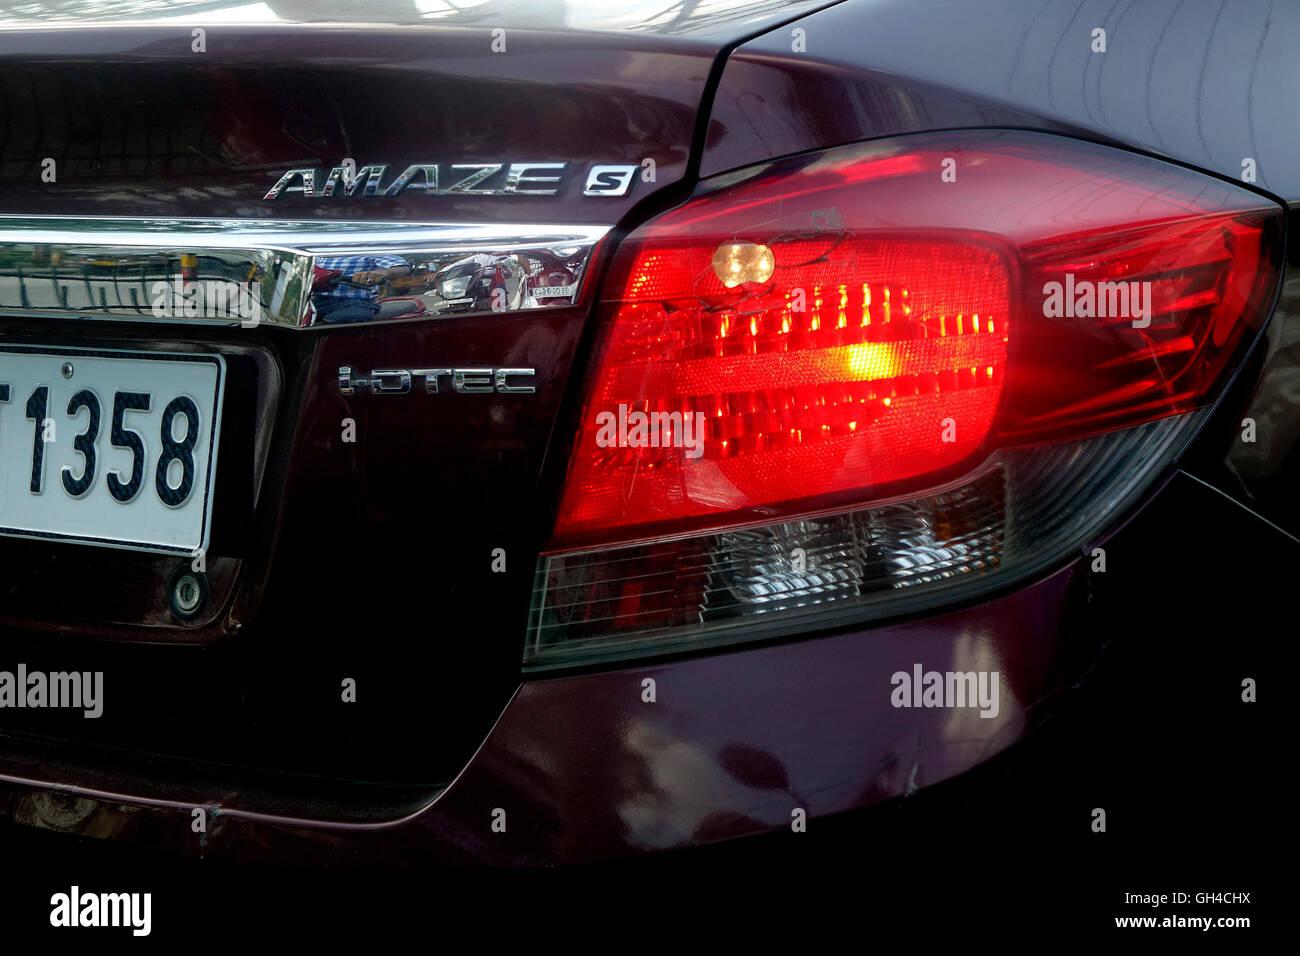 Close-up of a passenger car. - Stock Image